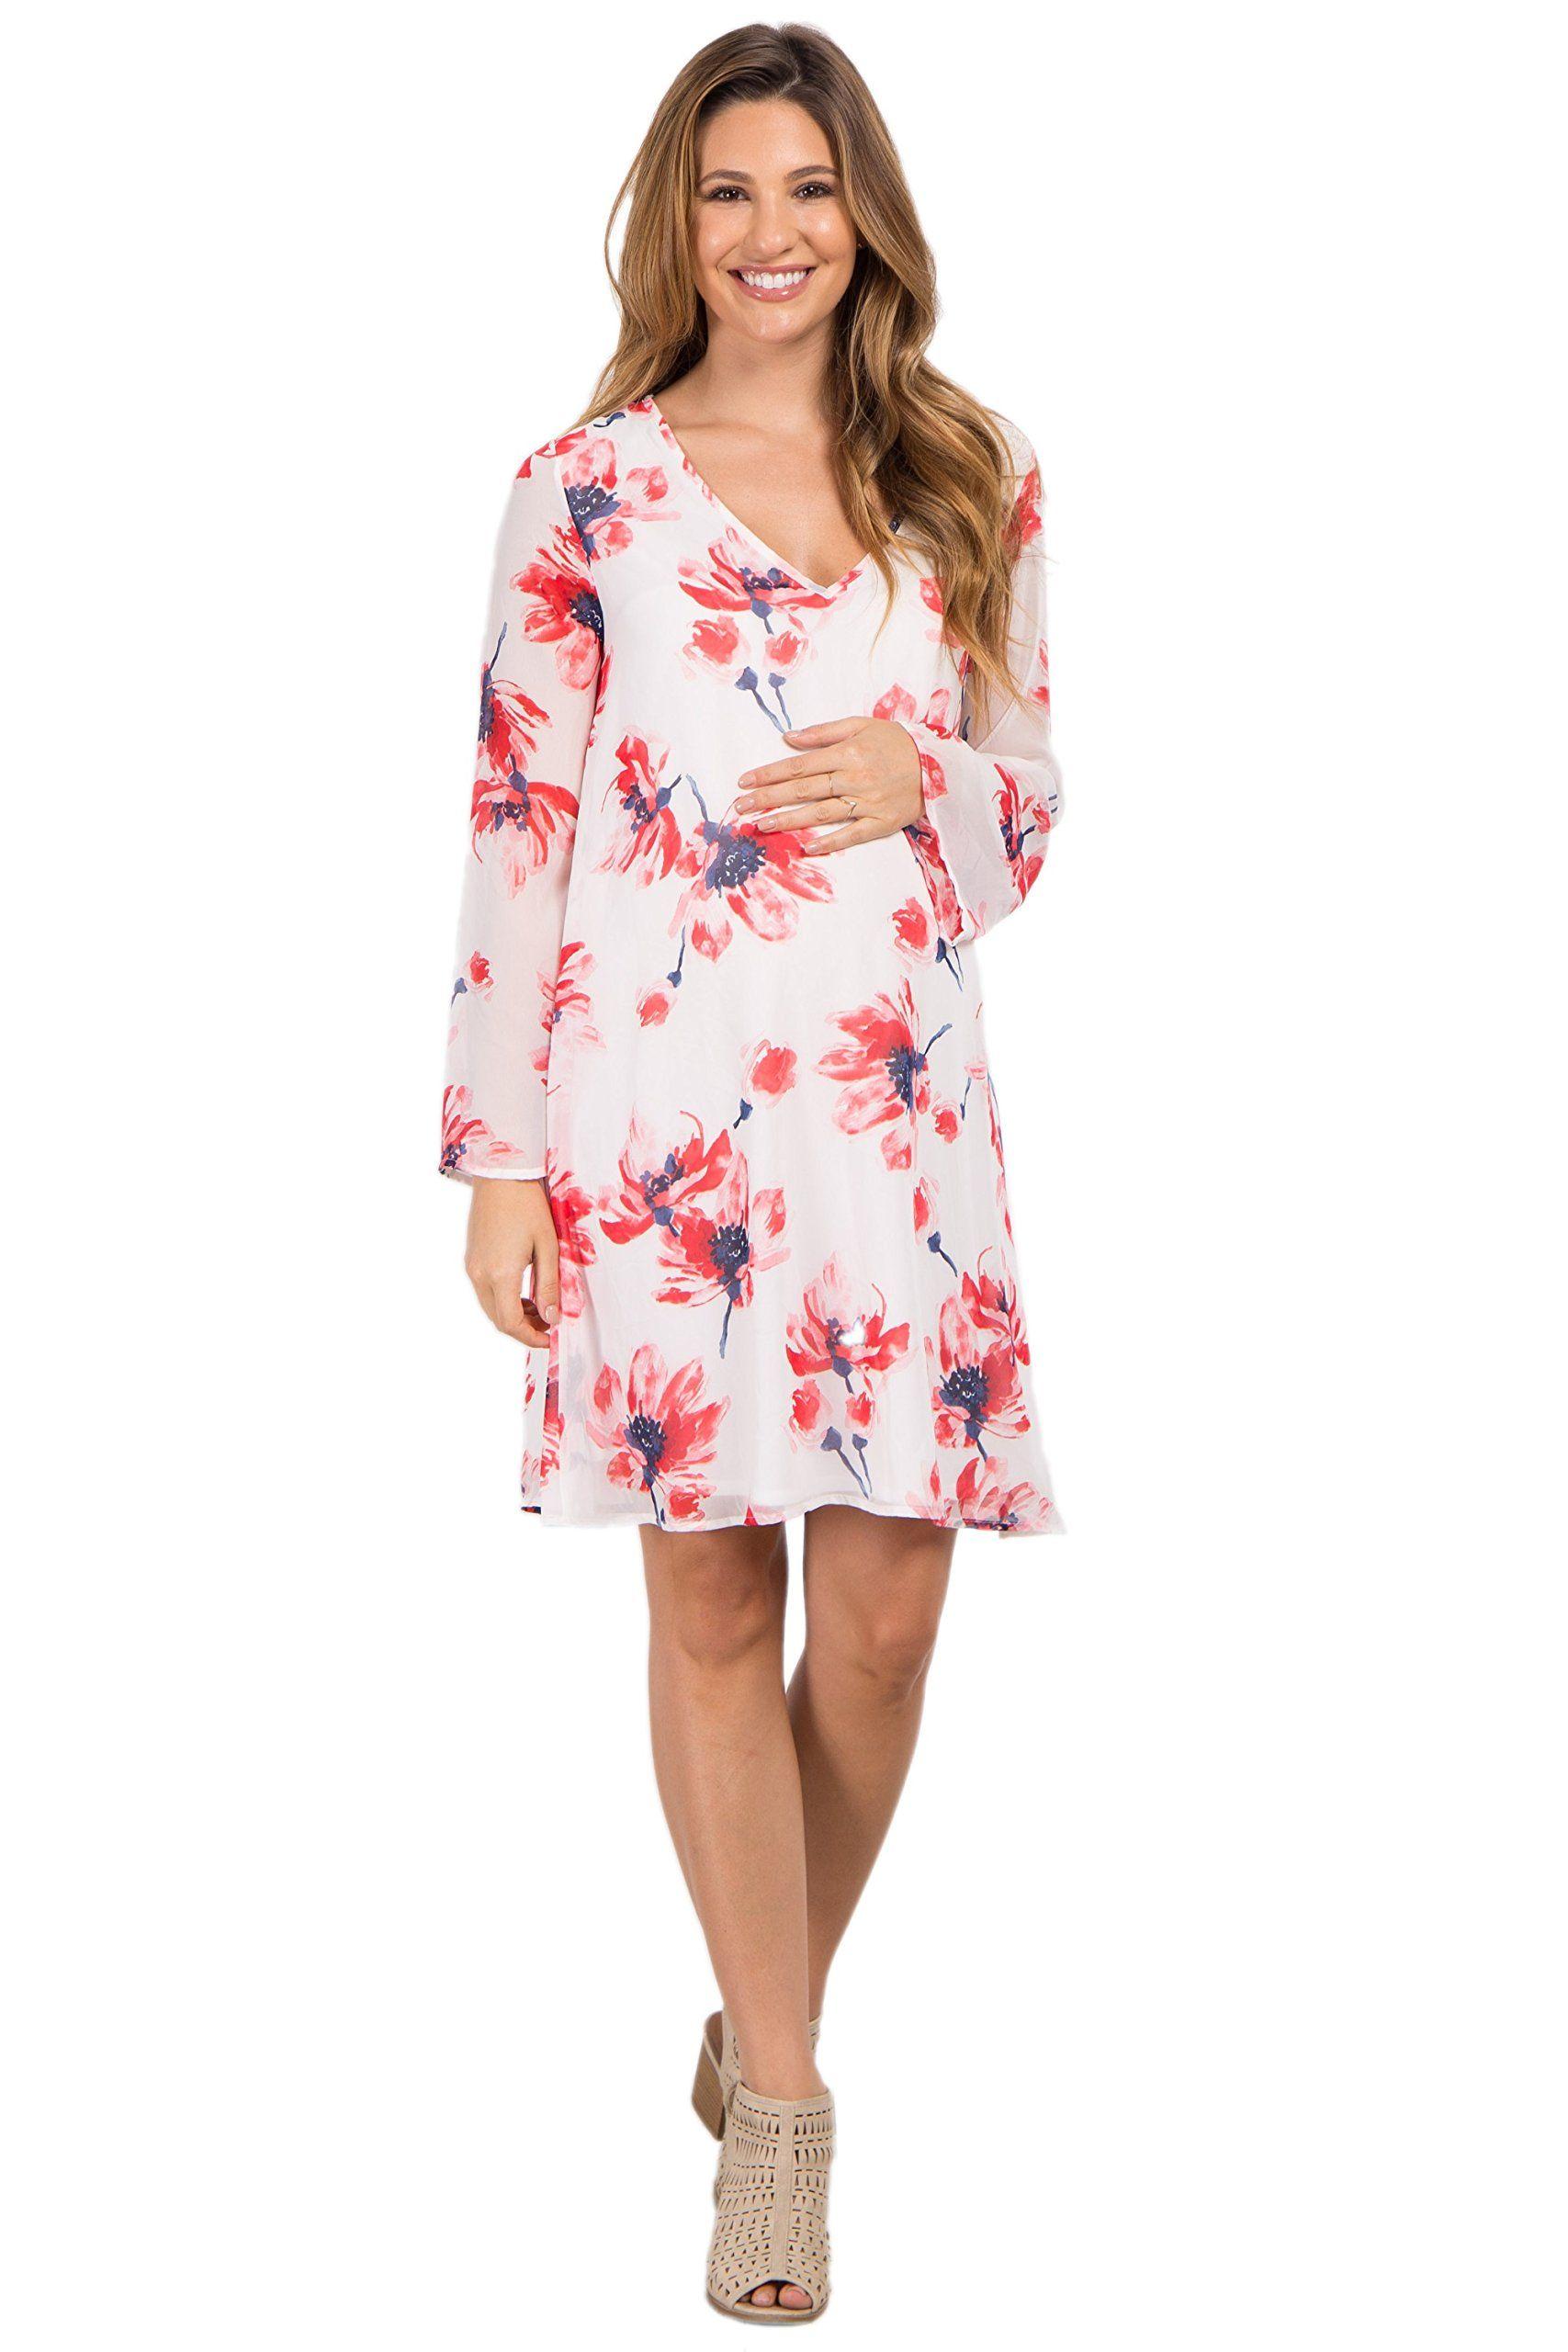 5473c3da0dcfd Maternity Fashion - PinkBlush Maternity Ivory Floral Chiffon Maternity Dress  Large -- Click the picture